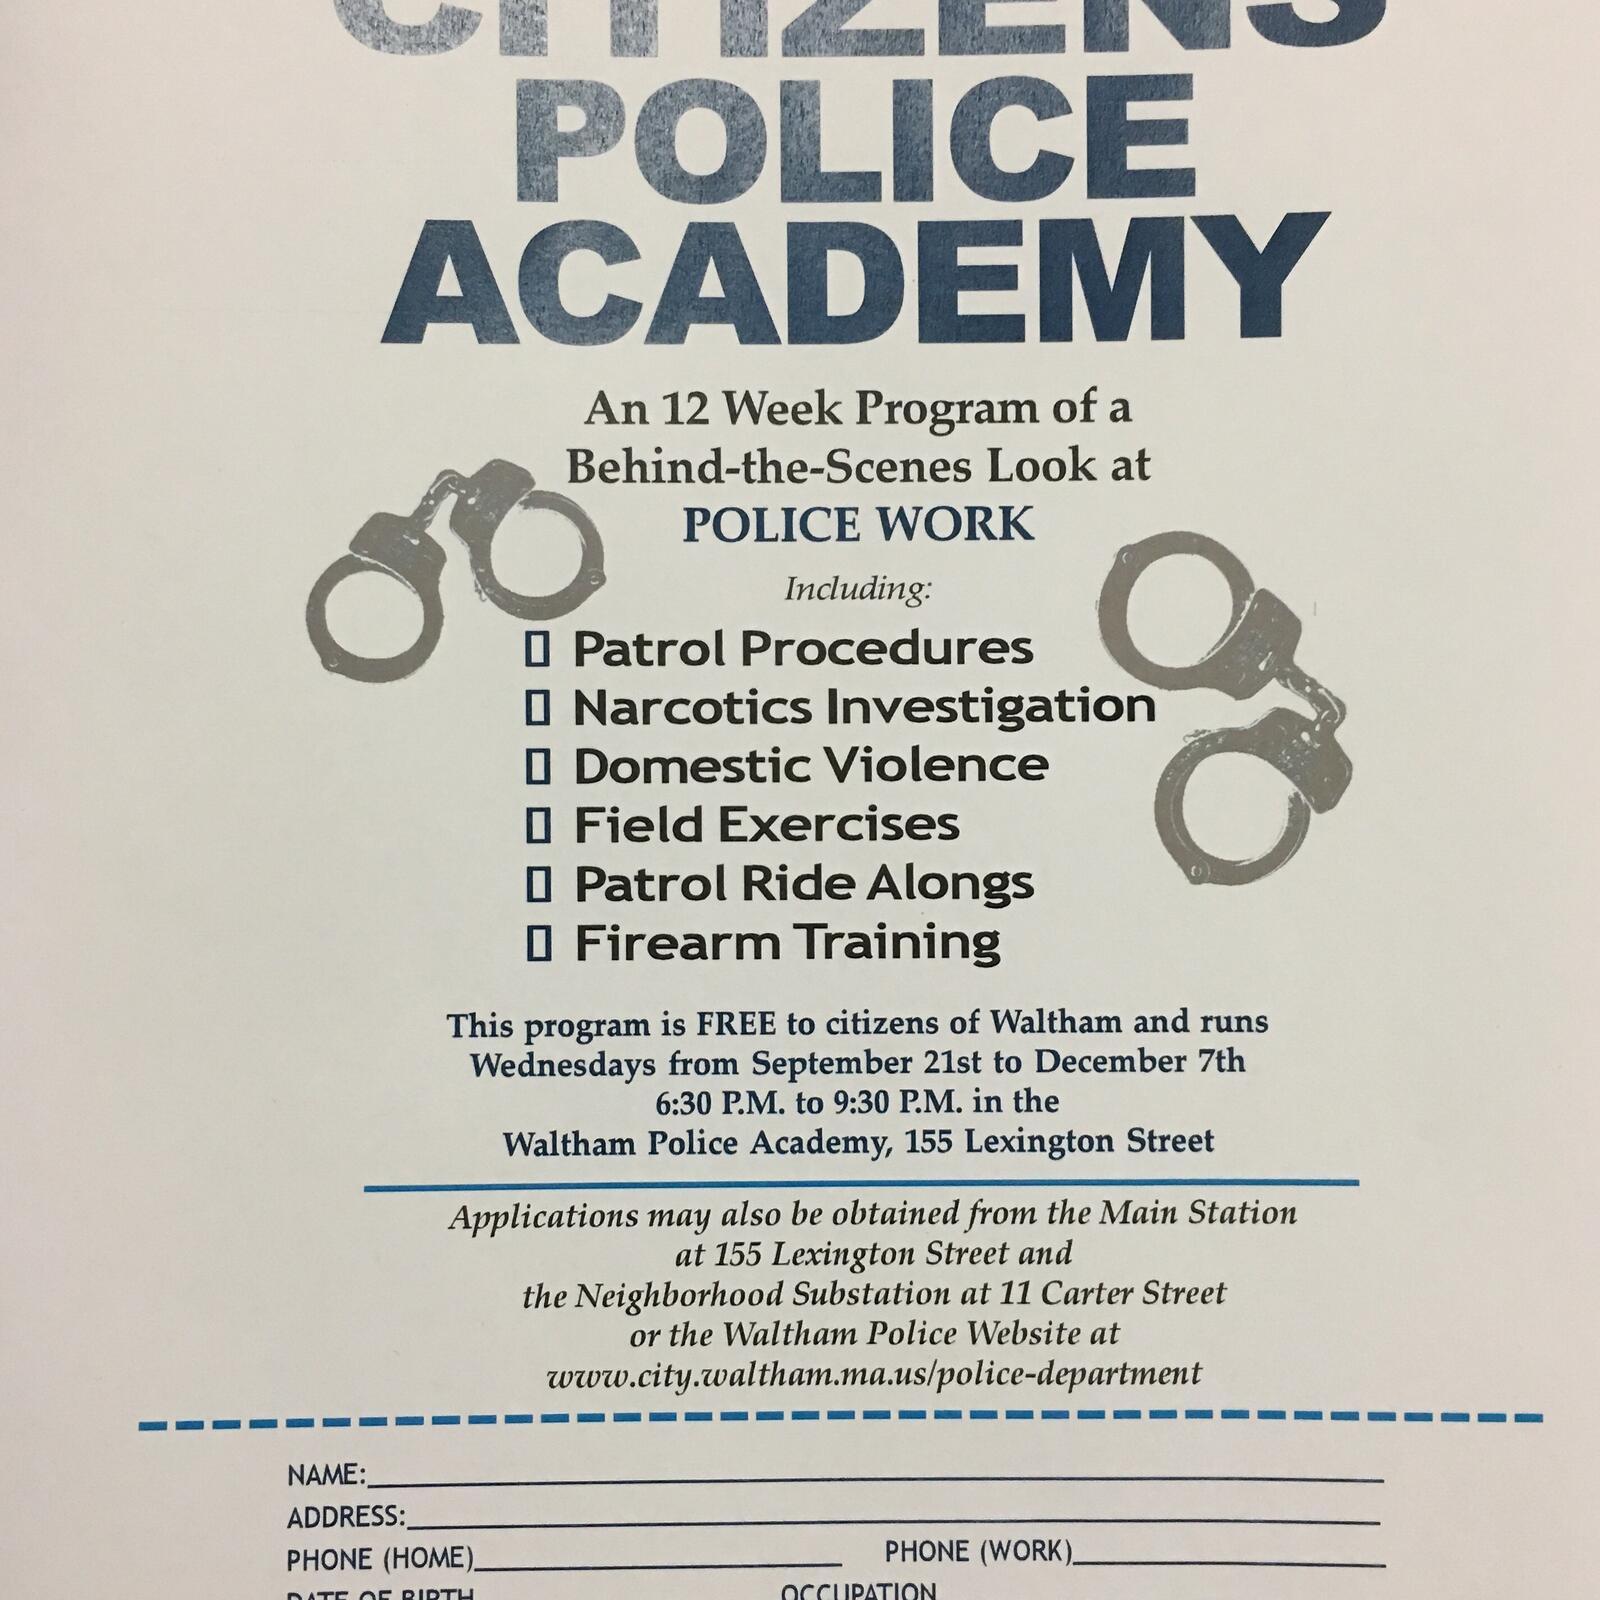 Citizens Police Academy (Waltham Police Department) &mdash